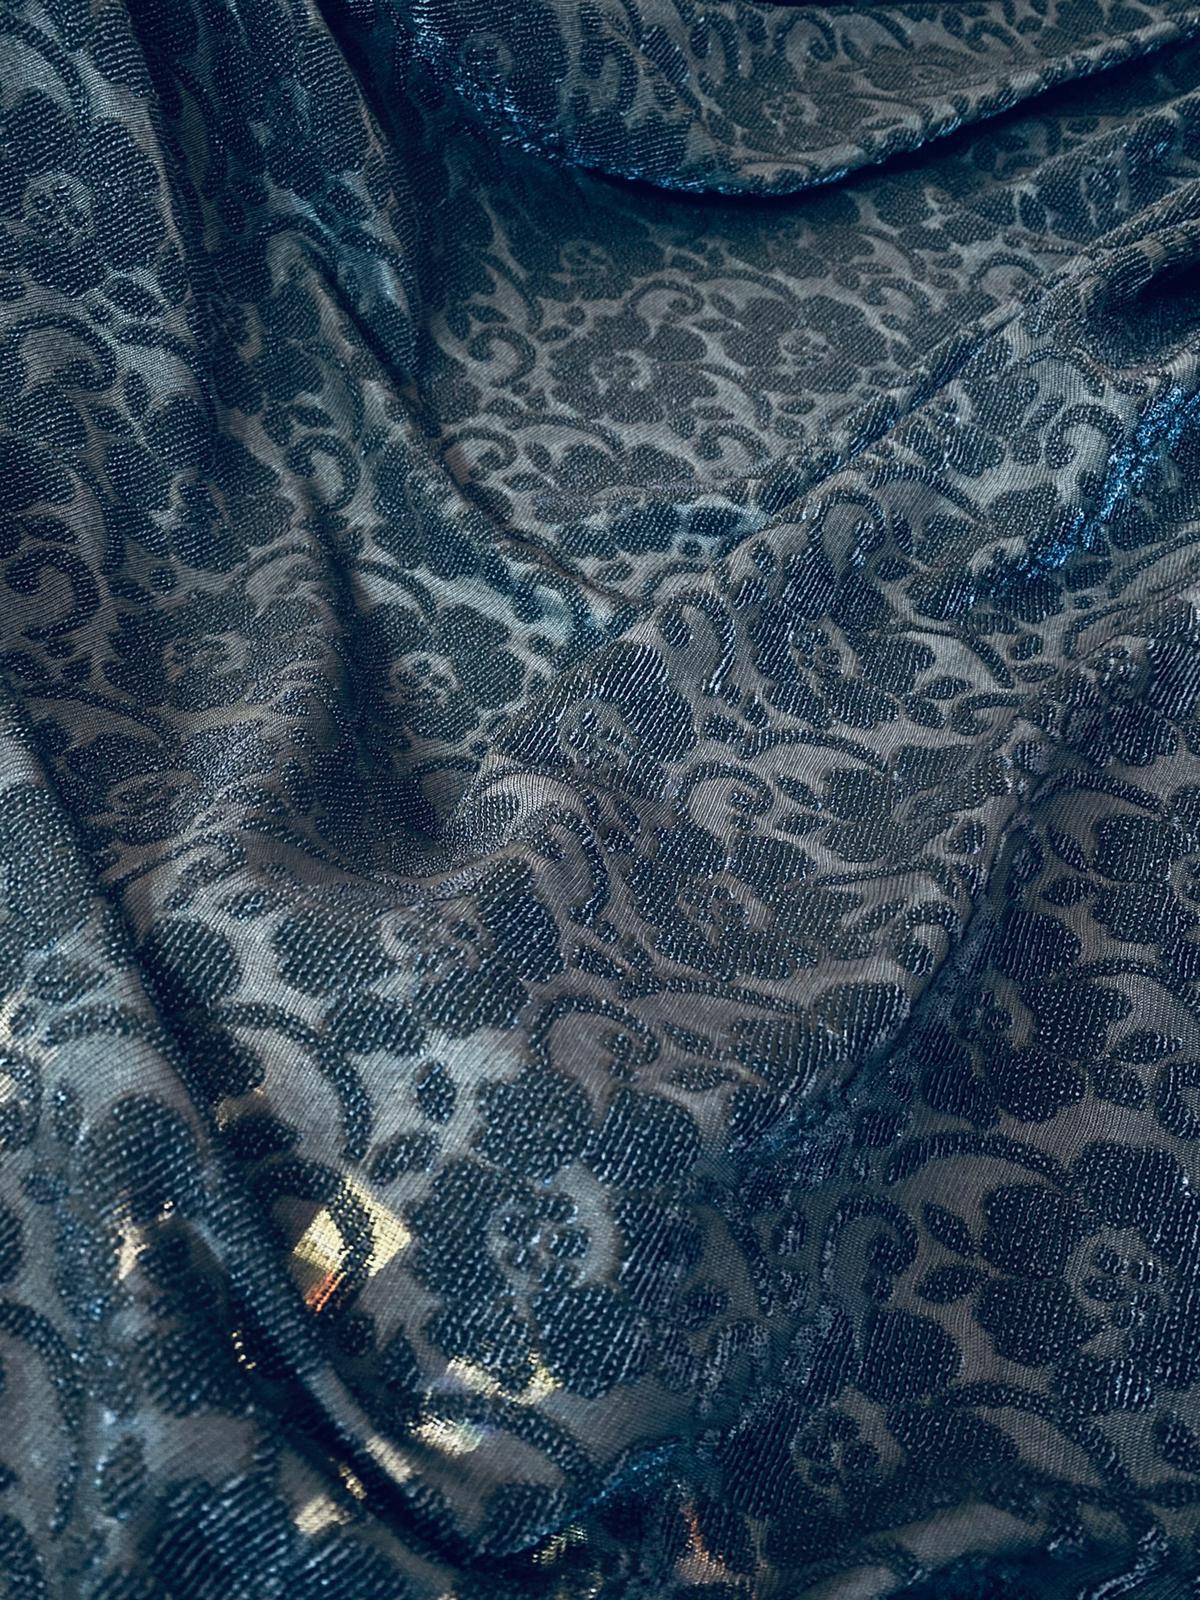 maglia damascata